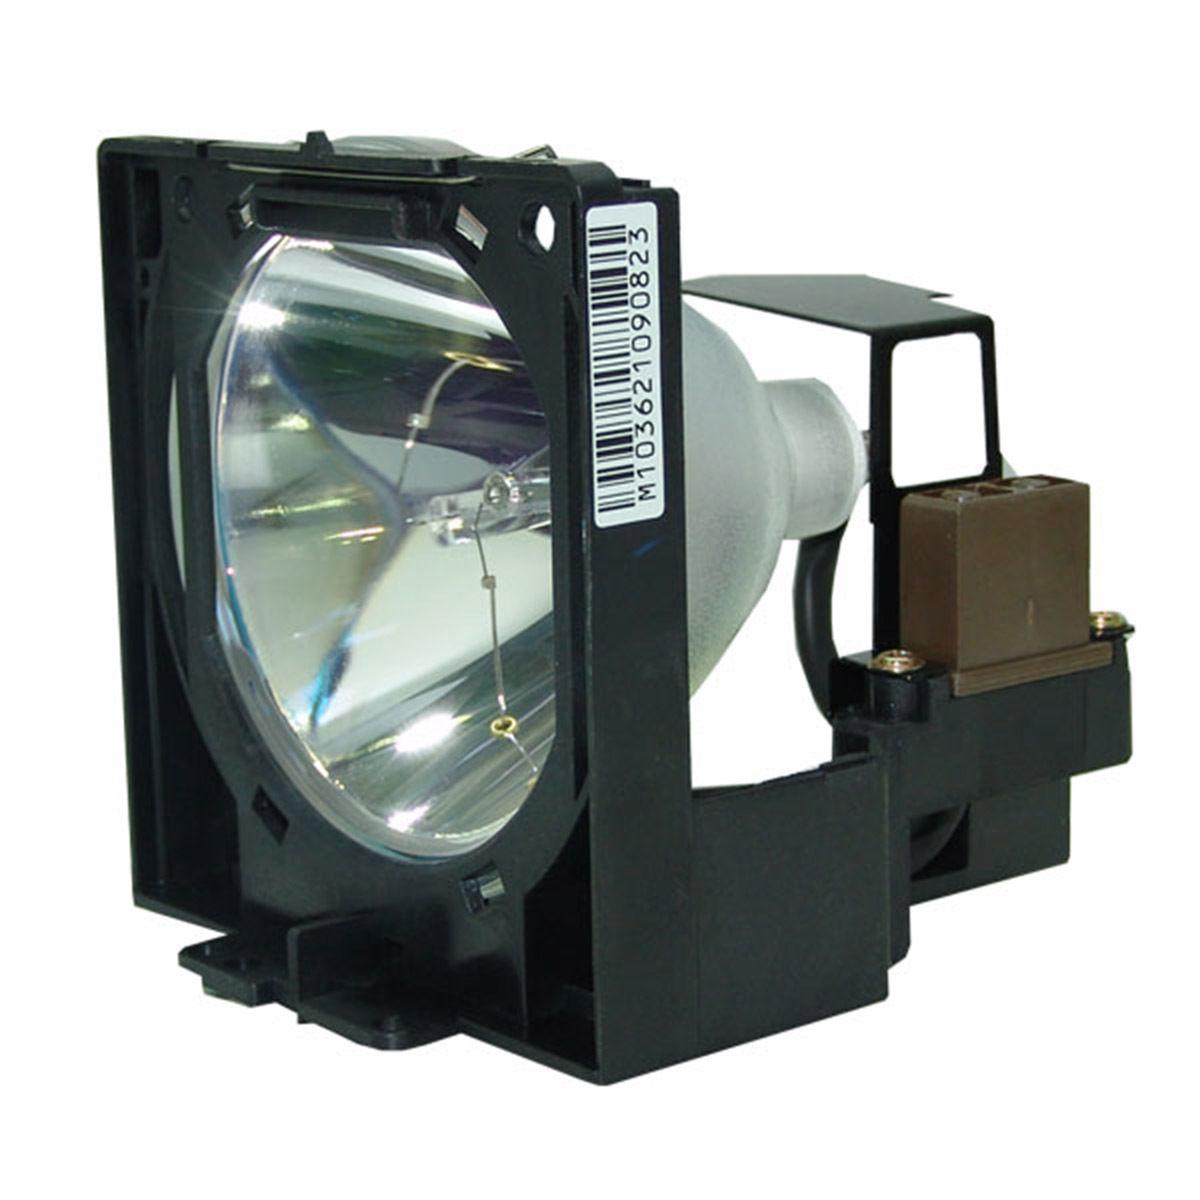 Projector Lamp Bulb POA-LMP18 LMP18 610-279-5417 for SANYO PLCSP20 PLC-XP07 PLC-XP10A PLC-XP10BA PLC-XP10EA PLC-XP10NA With Case replacement projector lamp bulb poa lmp18 for sanyo plc xp07 pcl sp20 plc xp10na projectors etc